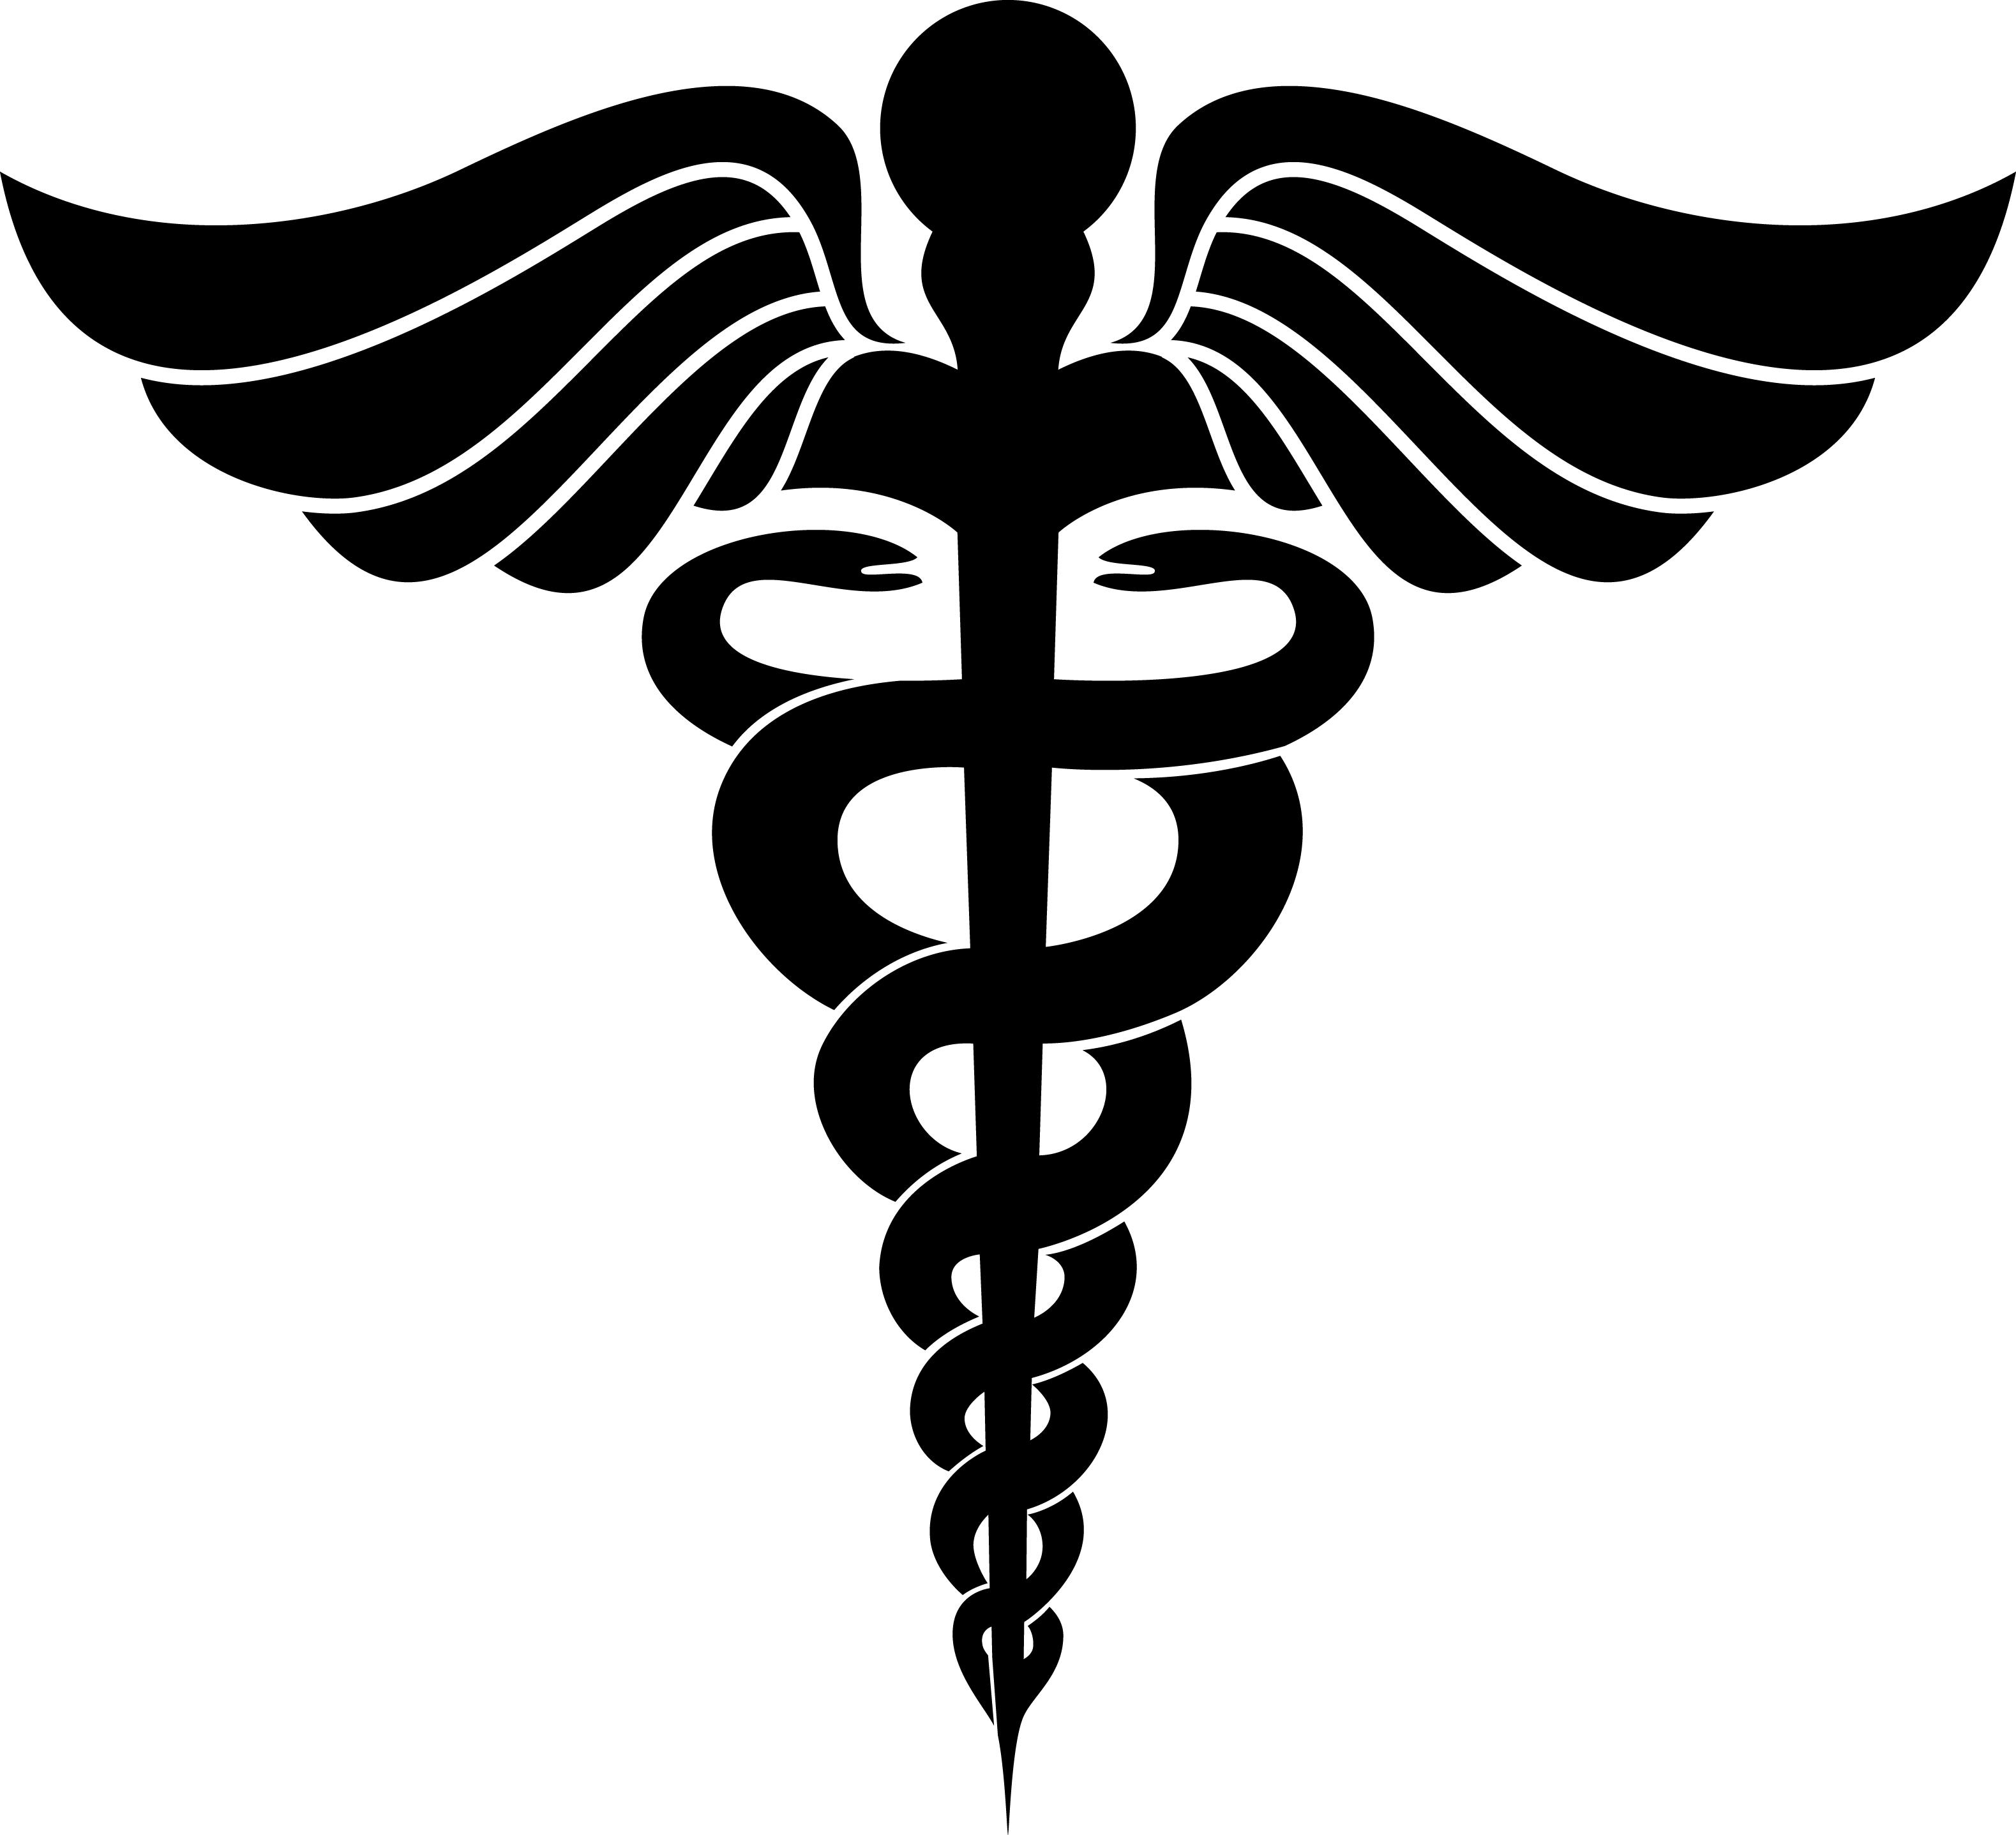 Rn logo clip art image freeuse Nurse Symbol Clipart - Clipart Kid image freeuse